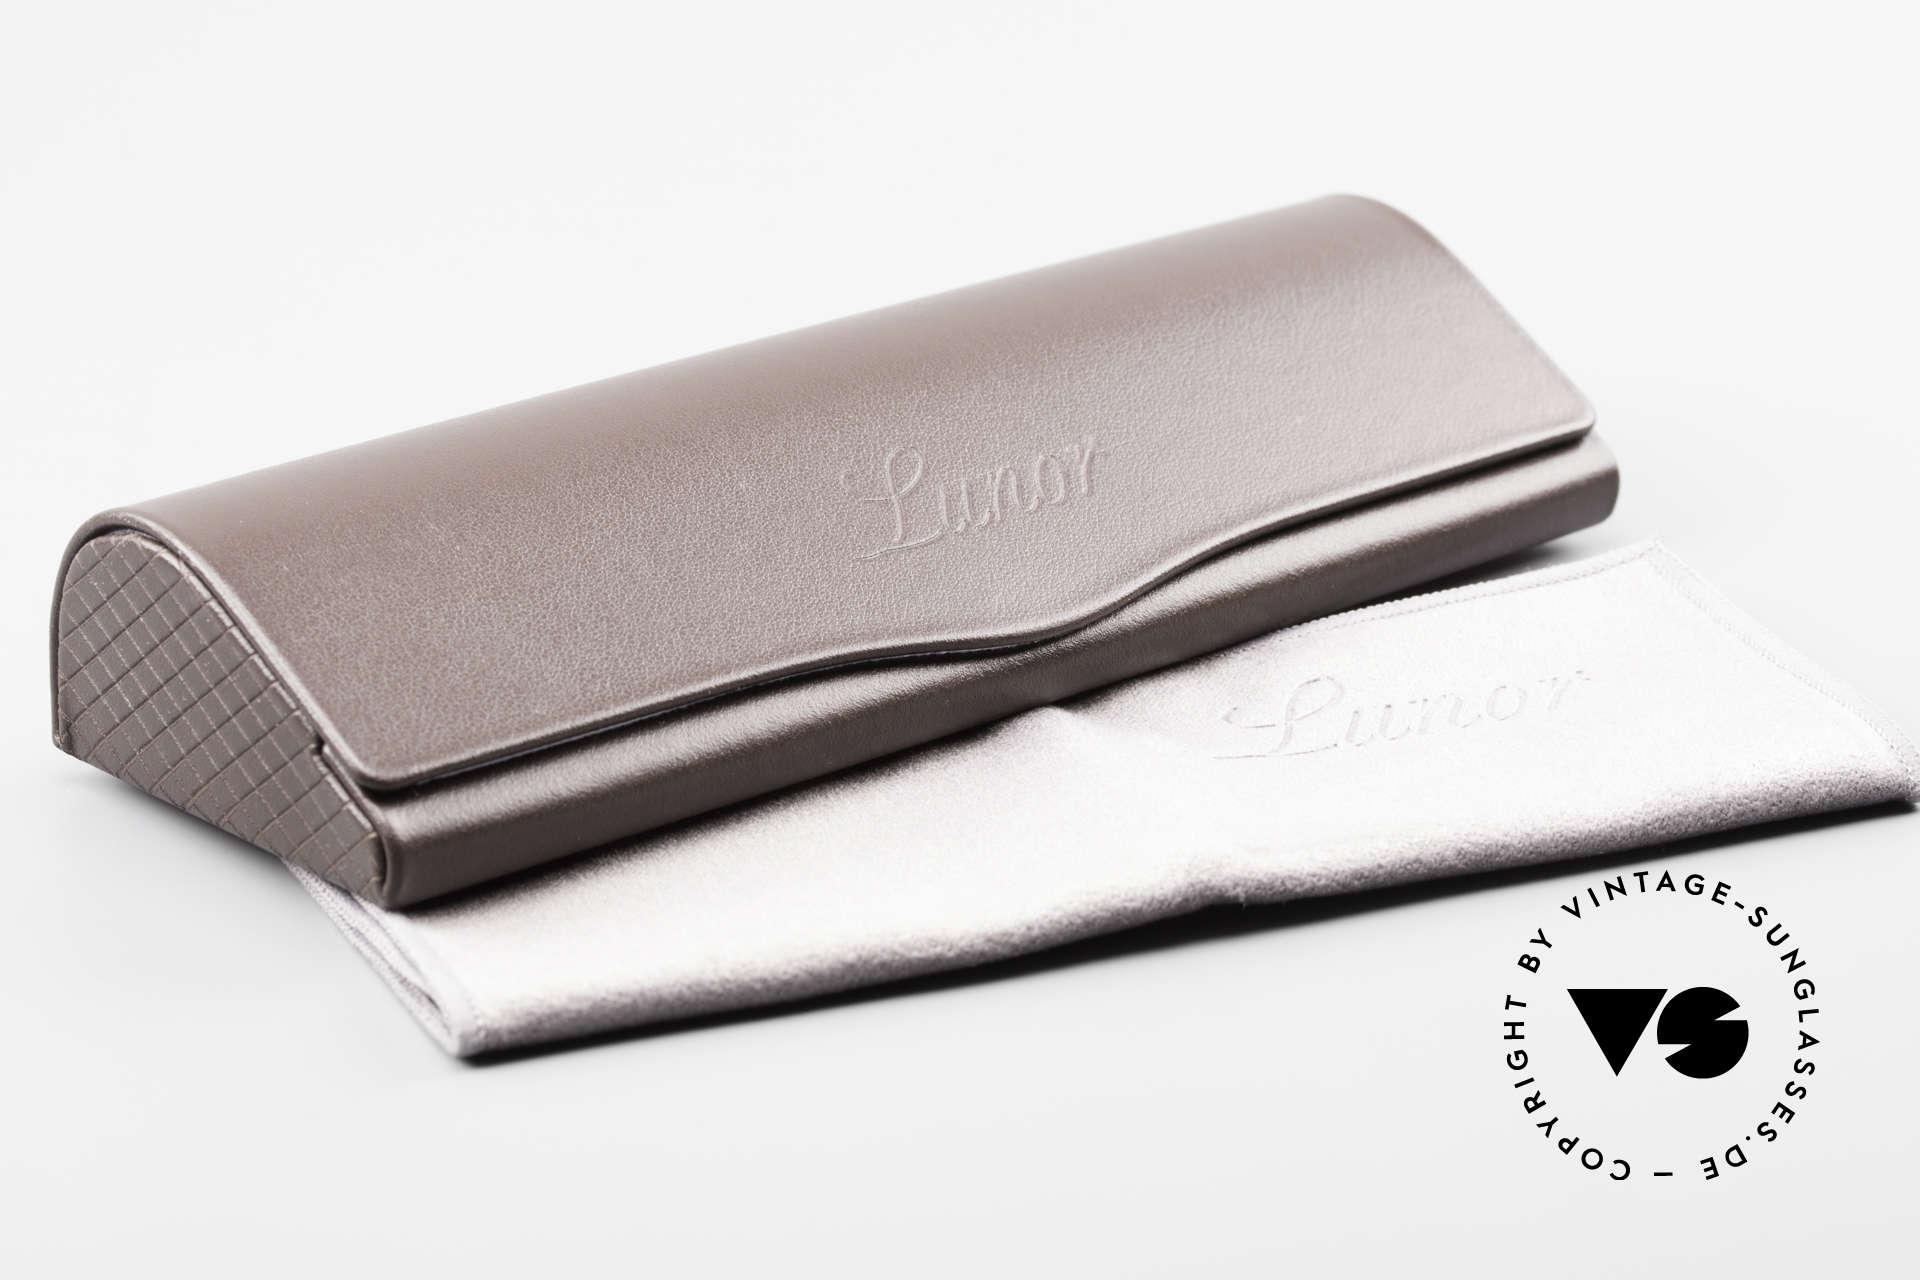 Lunor V 106 Full Metal Frame Platinum, Size: medium, Made for Men and Women